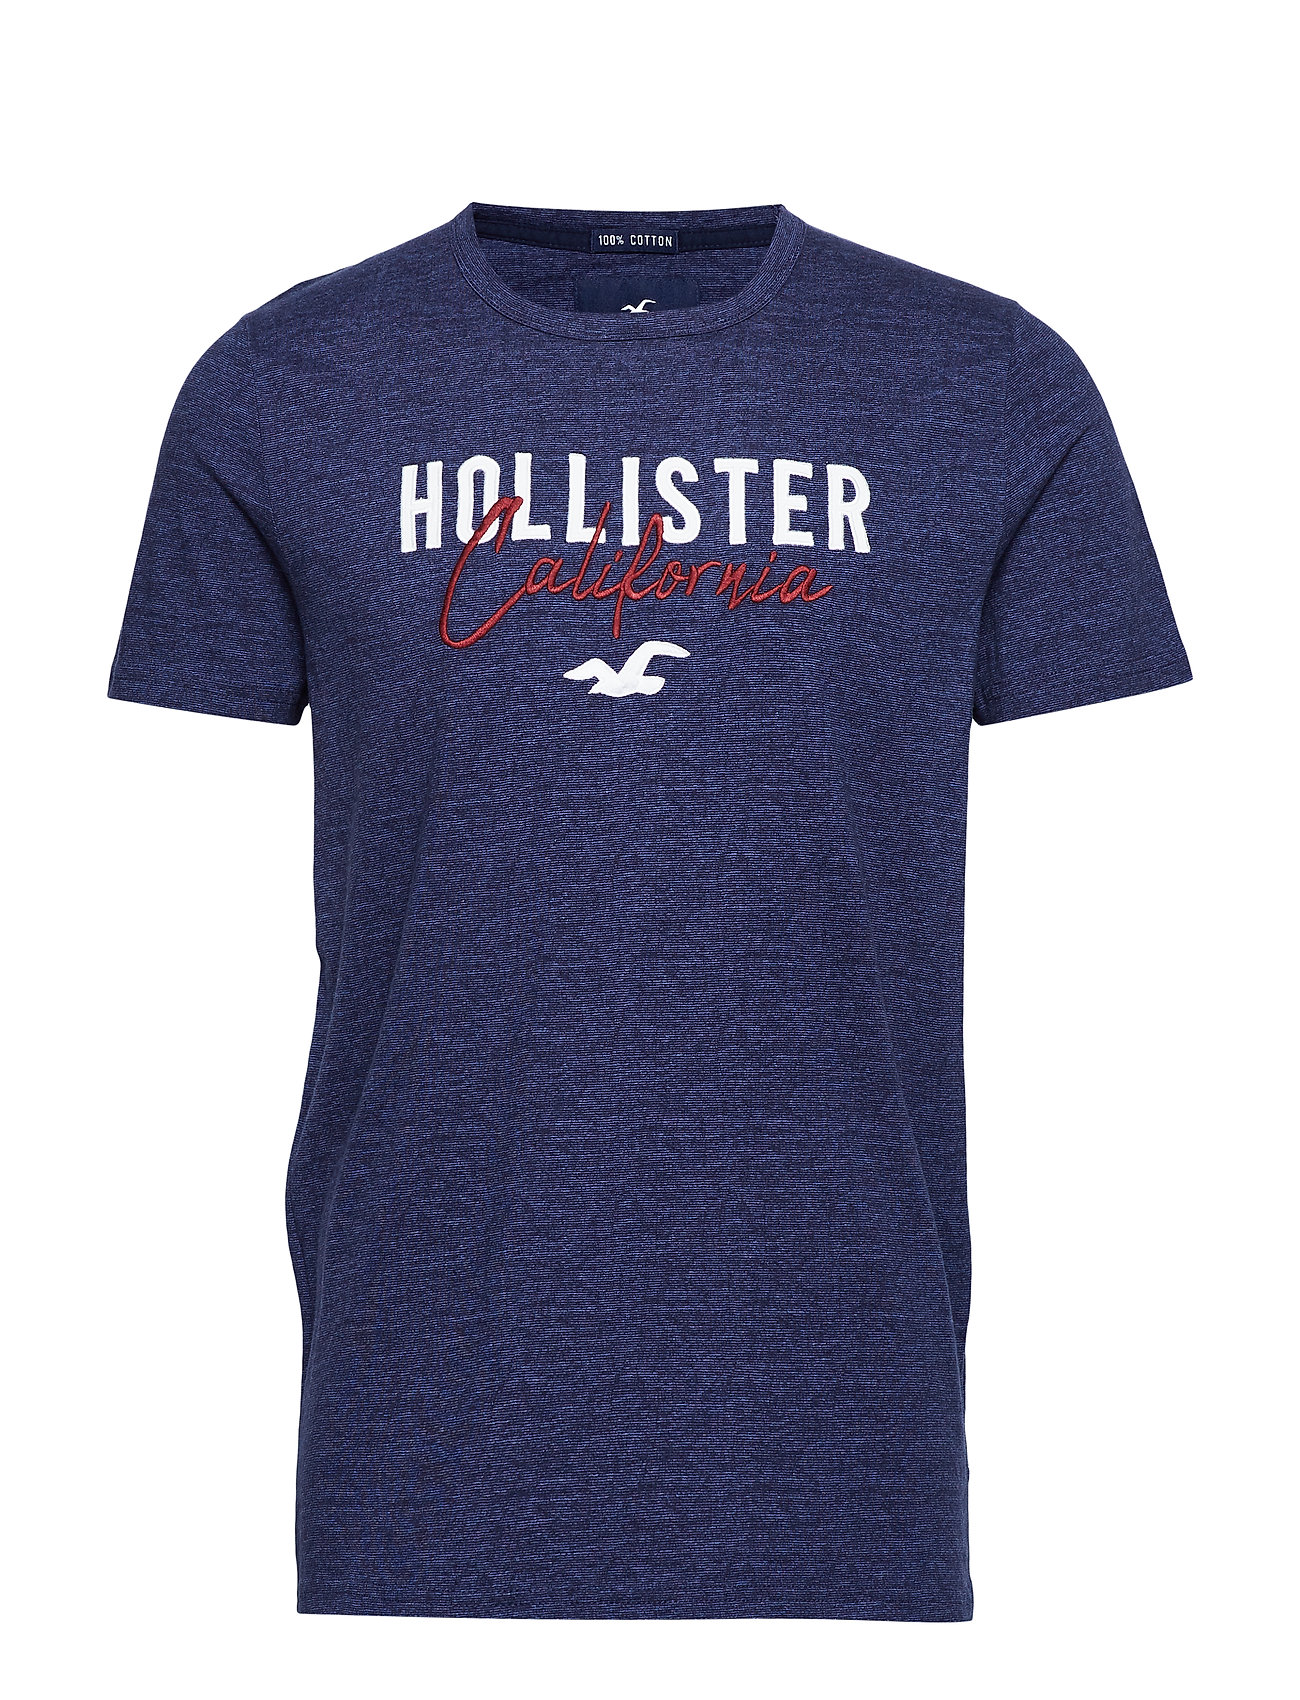 Hollister Graphic T-Shirt - MED BLUE SD/TEXTURE